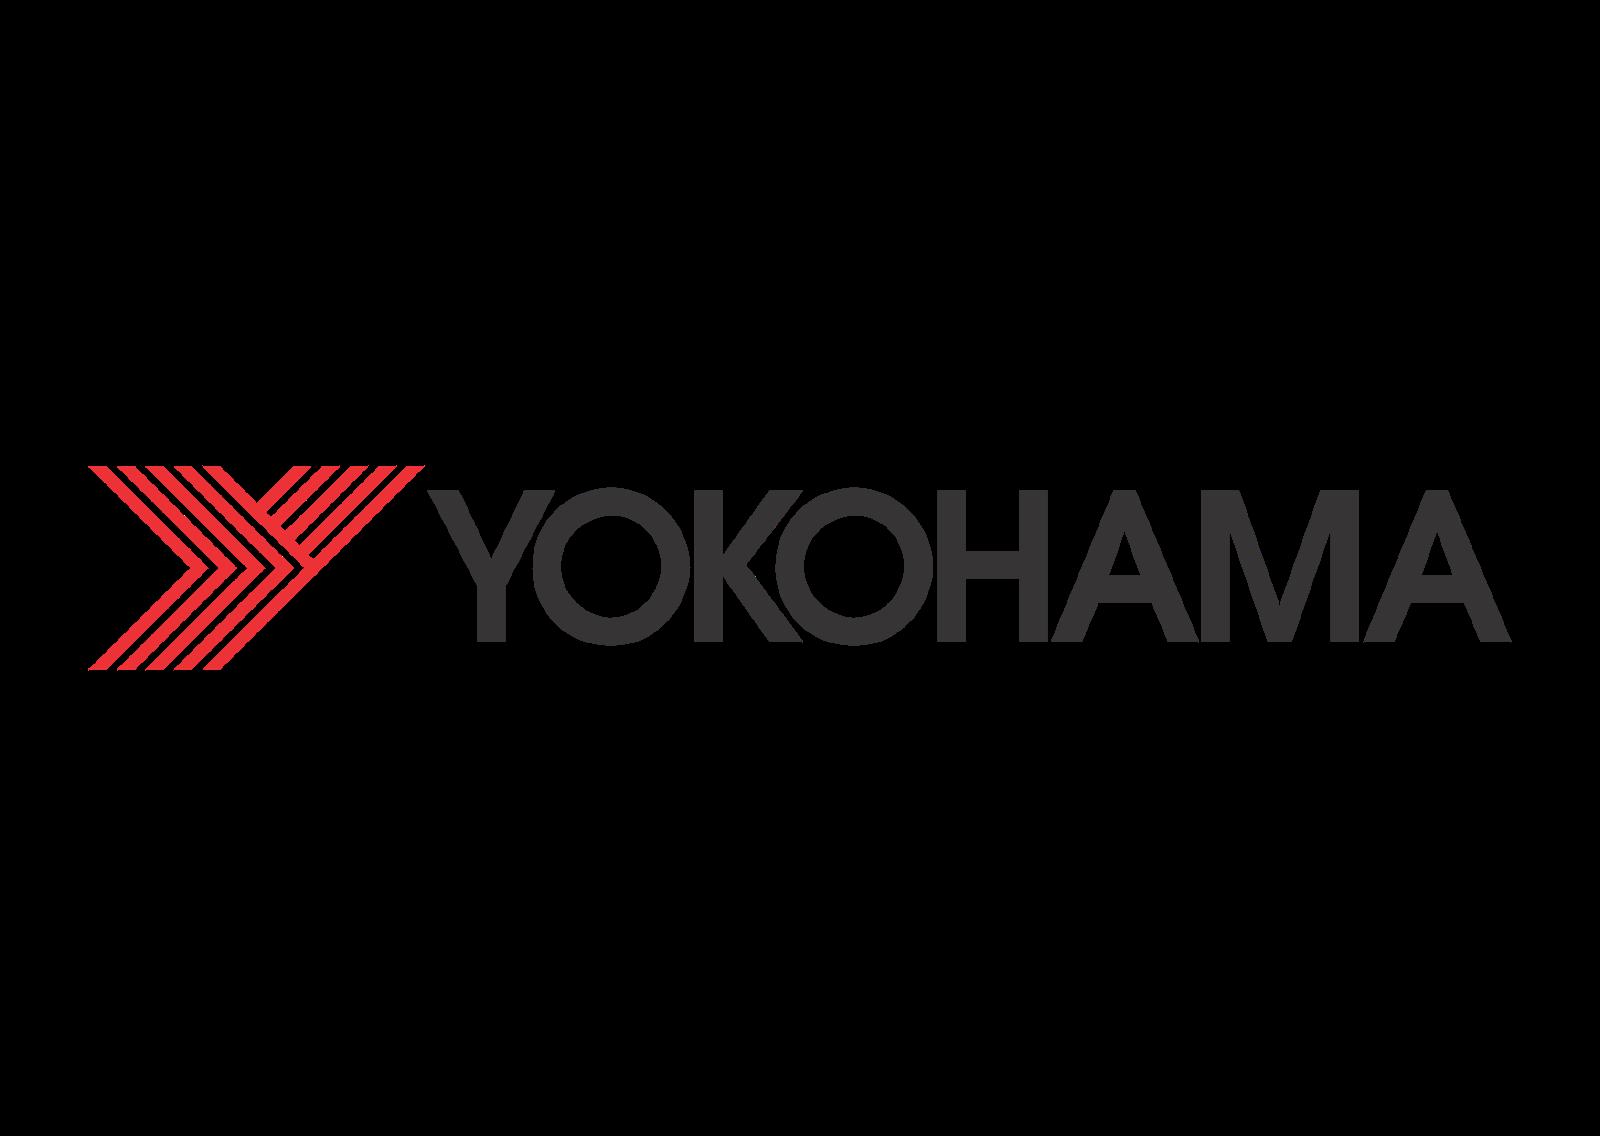 Yokohama Logo Png 54051 NEWSMOV.